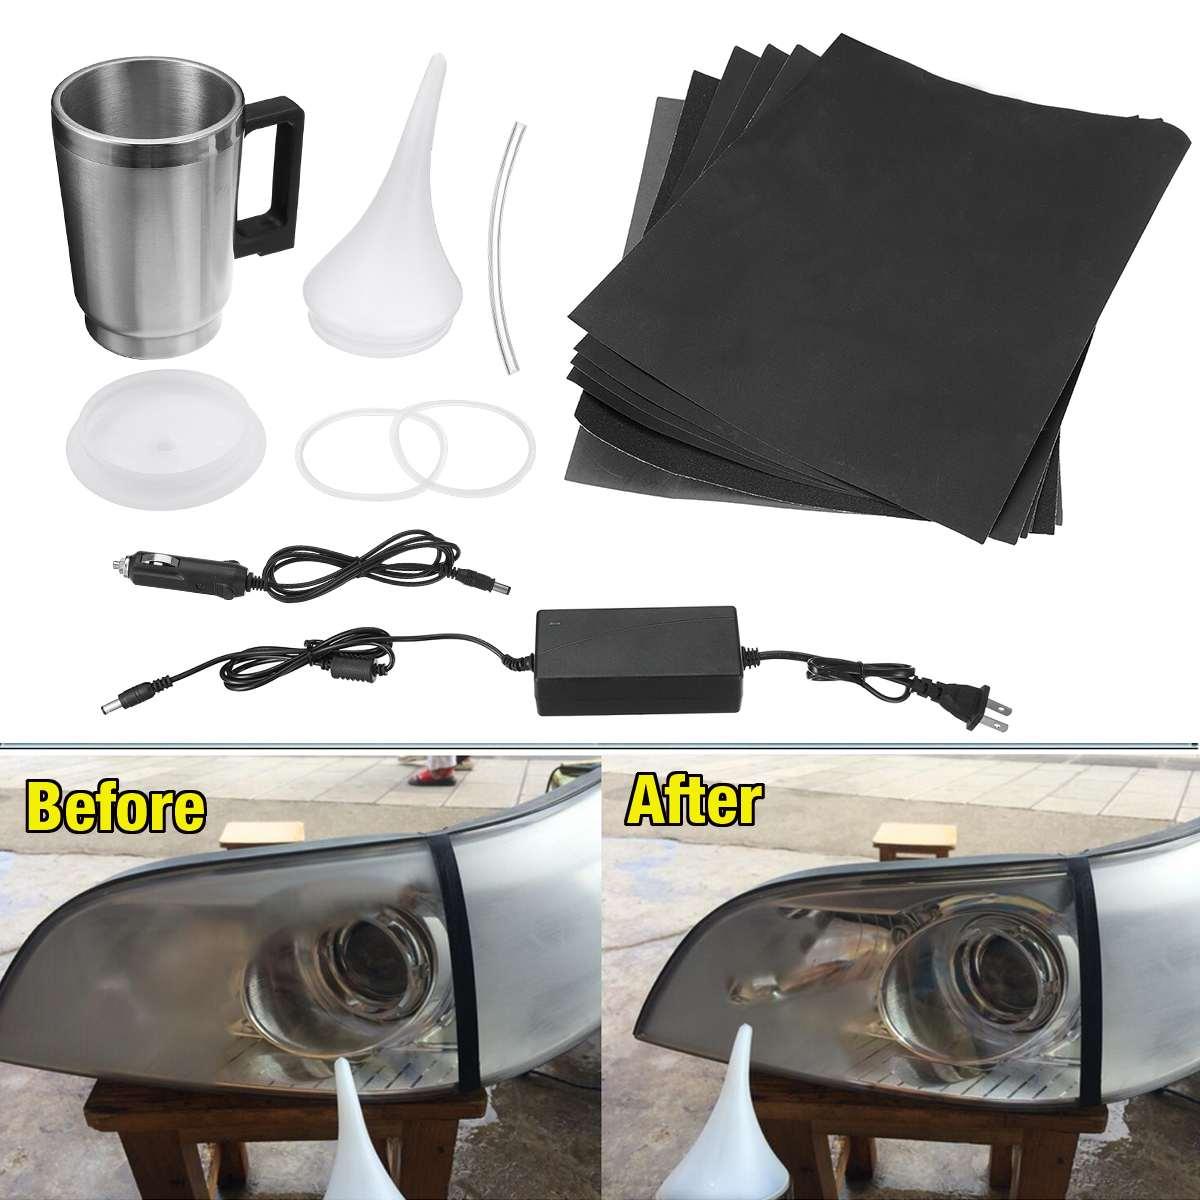 New 2 Styles Cover Car Headlight Refurbished Electrolytic Atomized Cup Headlamp Repair Liquid Repair Tool